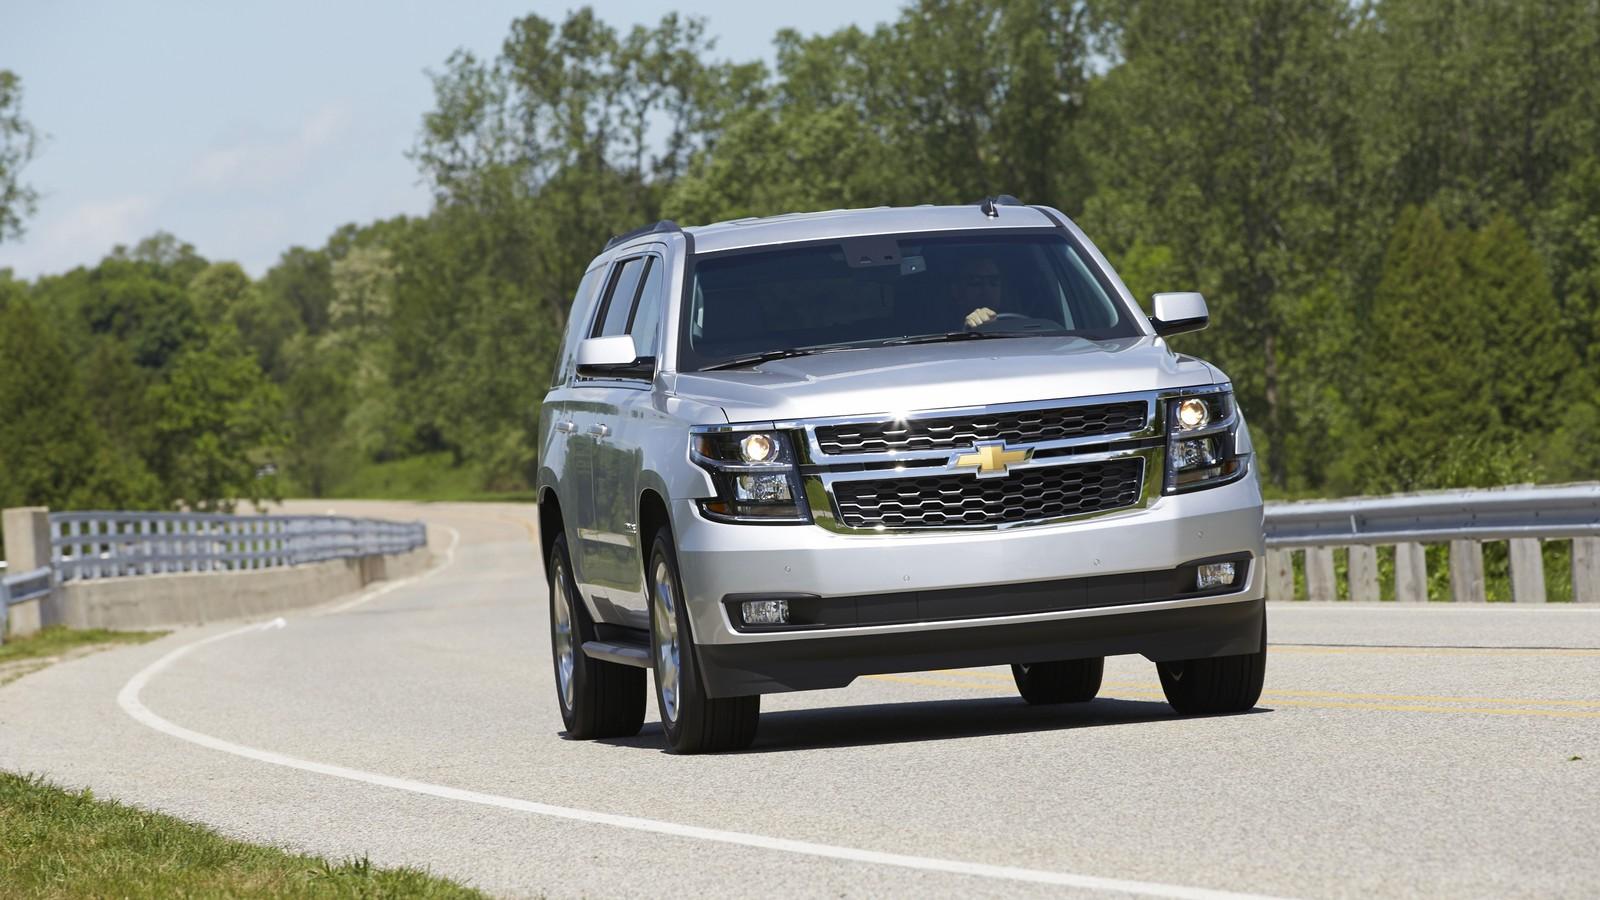 Oбновленный Chevrolet Tahoe LT